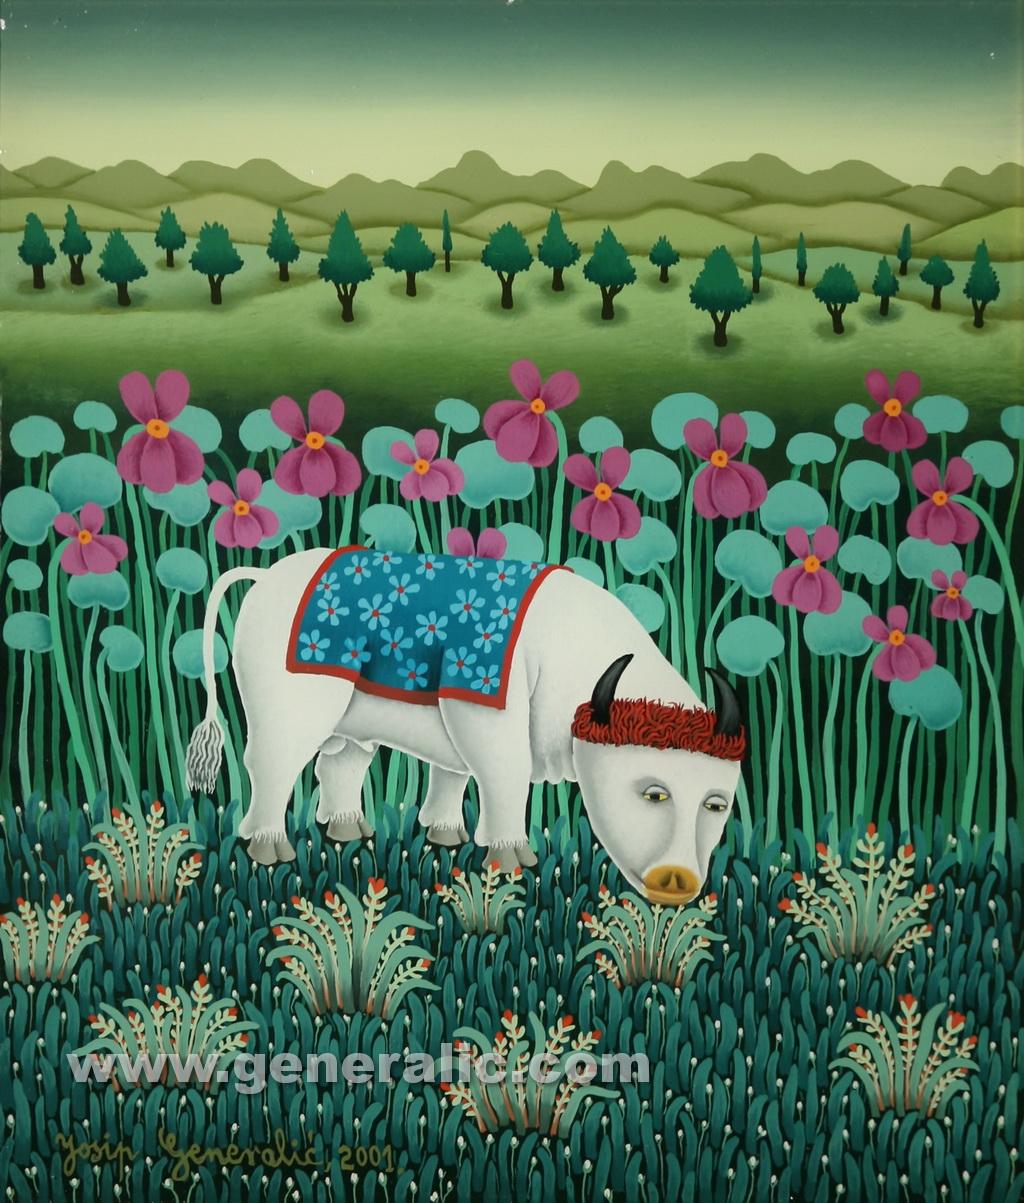 Josip Generalic, 2001, White cow, oil on glass